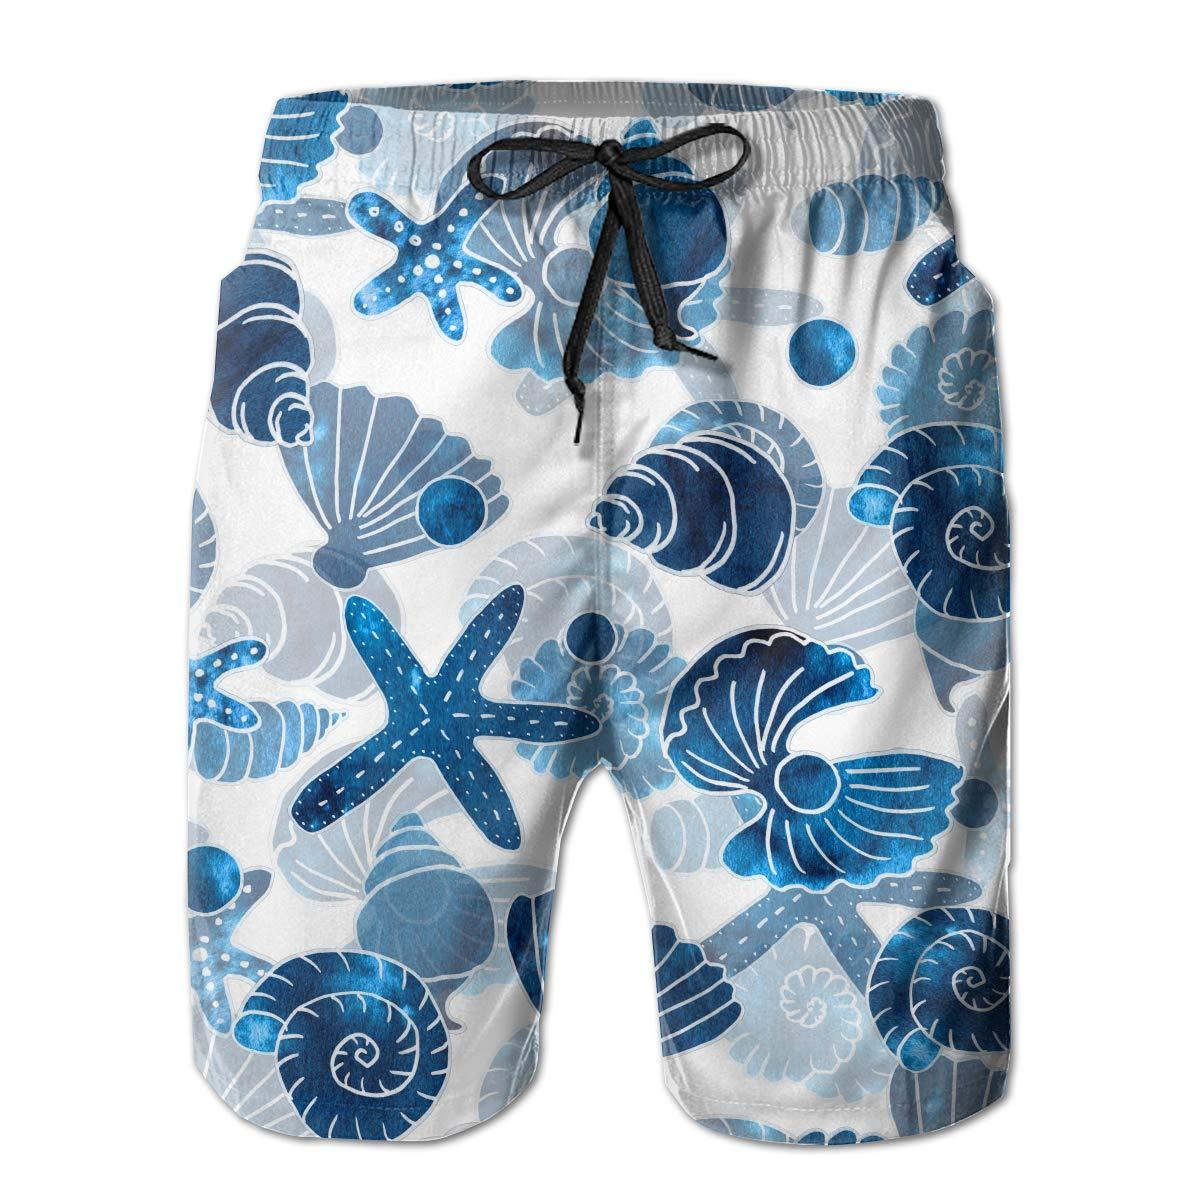 FRS Ltd Shells Sea Pattern Mens Quick Dry Swim Trunks Beach Board Short Drawstring Vacation Surfing Shorts